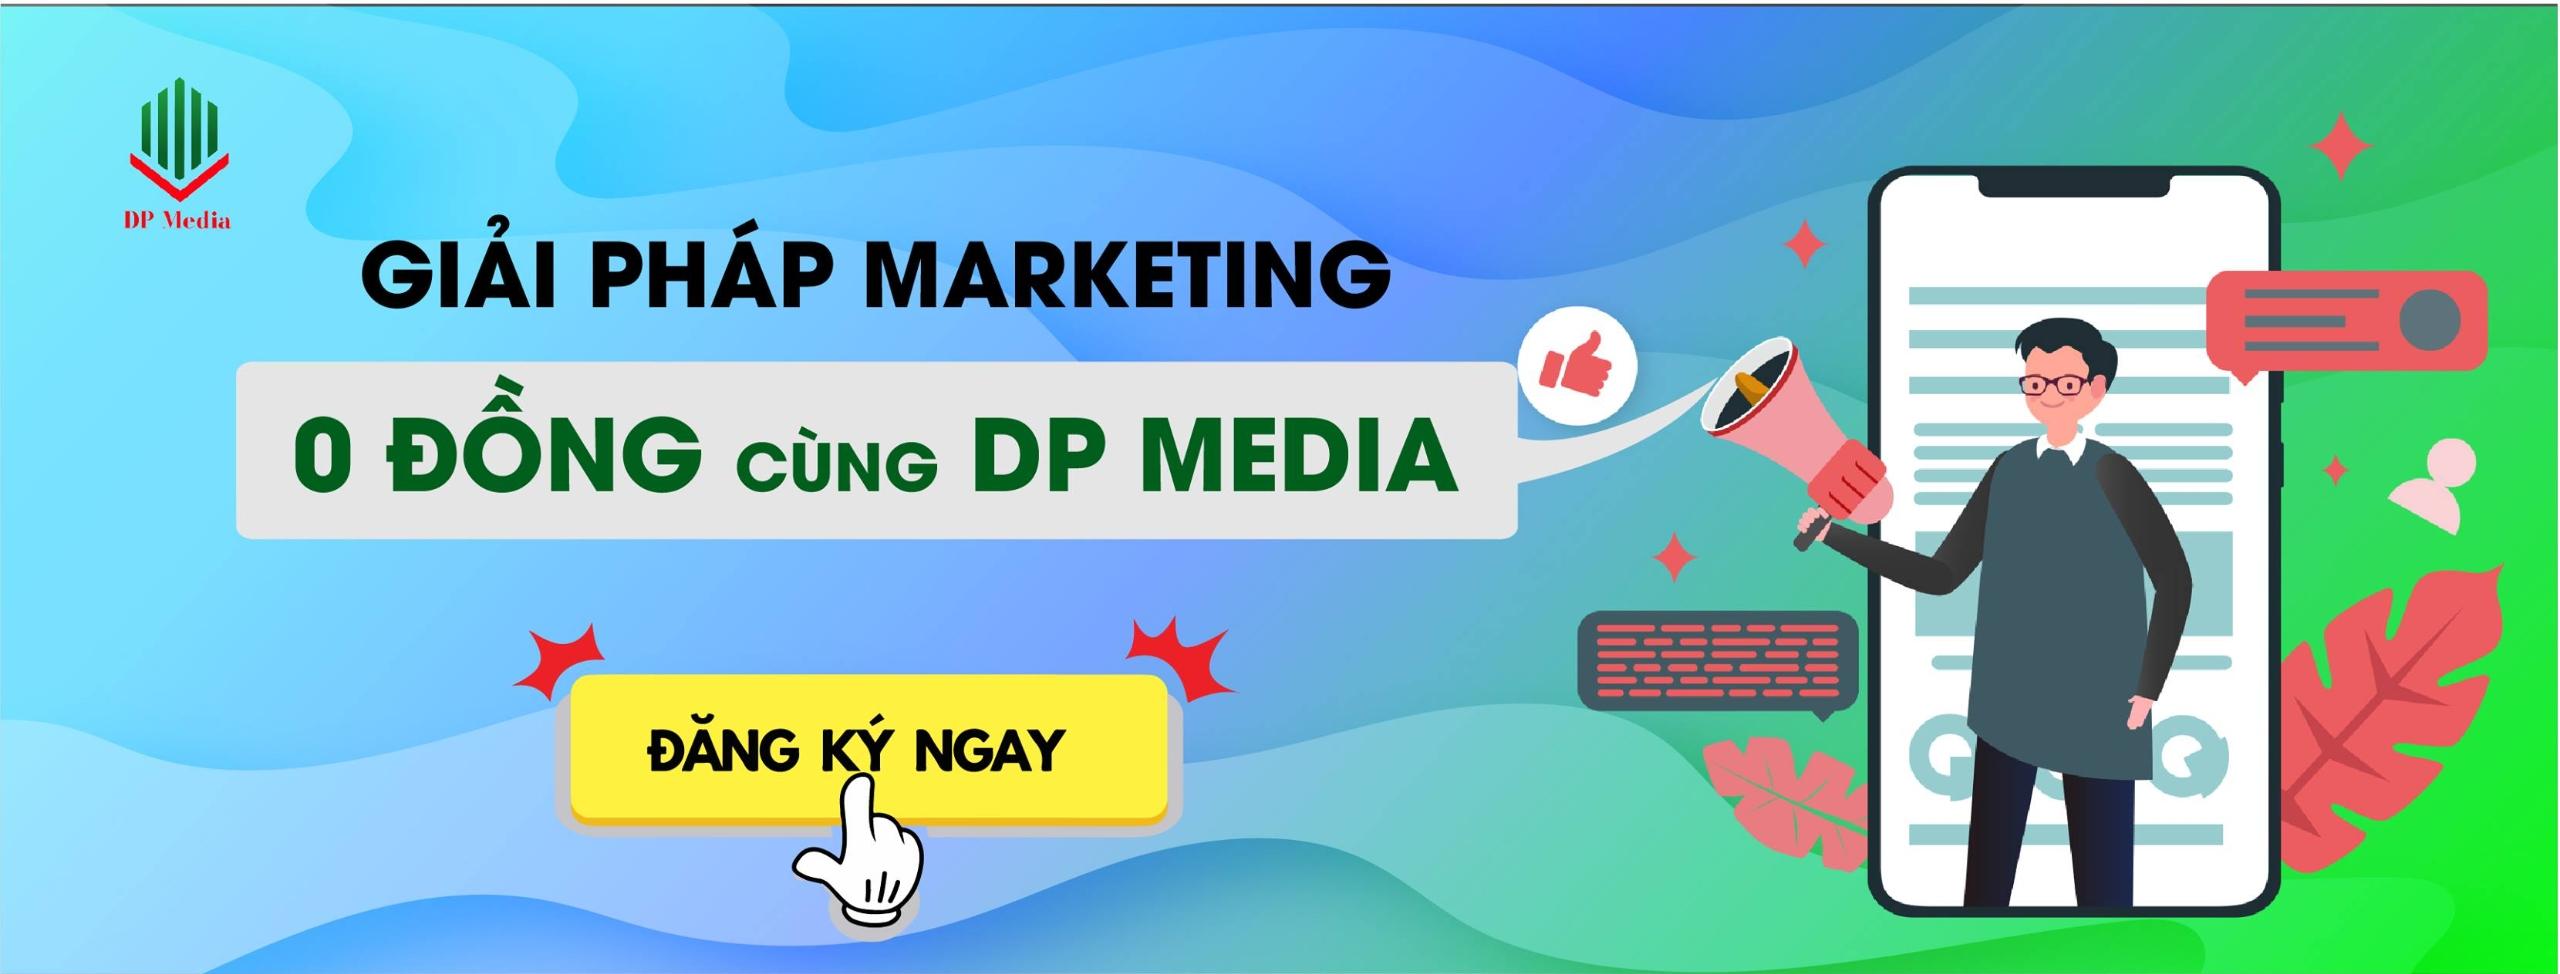 DP Media (@dpmedia) Cover Image